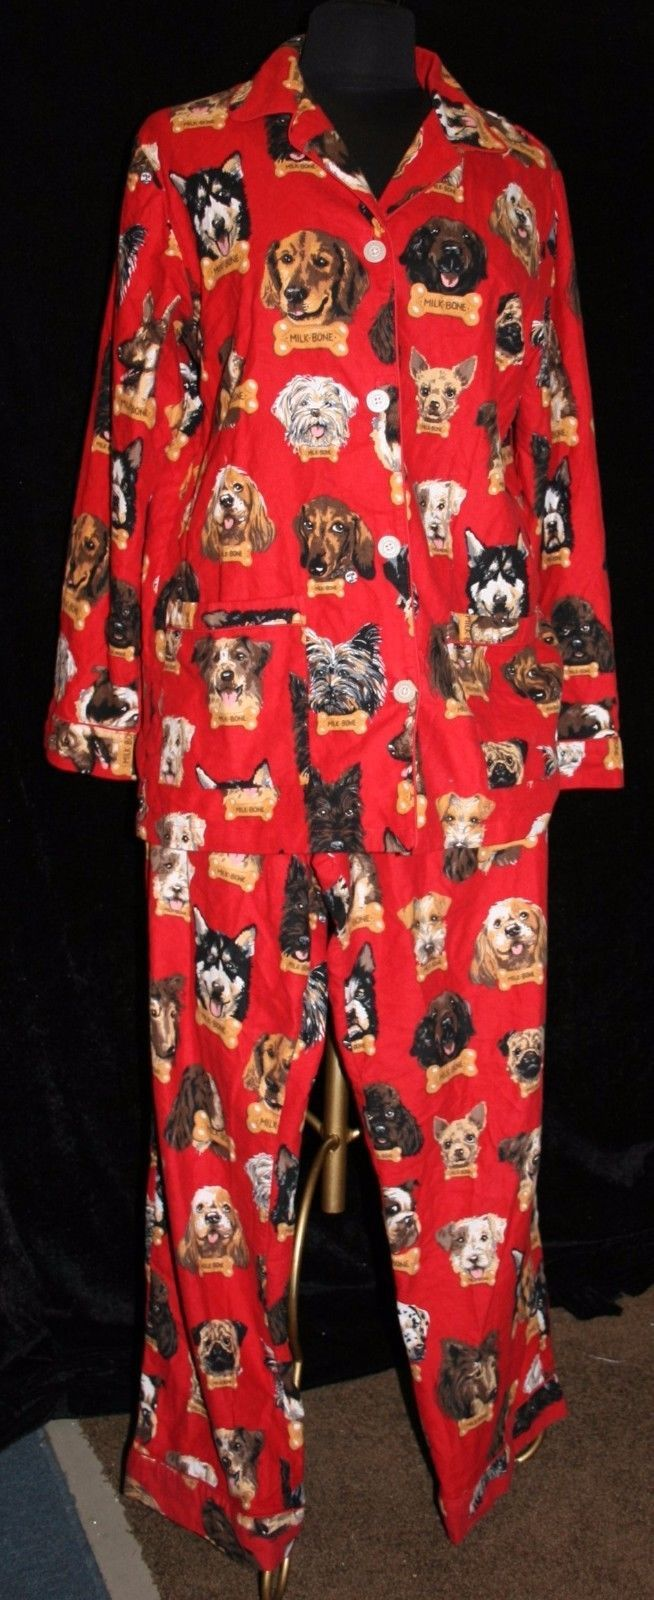 Womens Nick & Nora Flannel Pajamas Red Milk Bone Dog M / S PJ Lounge Top Bottom